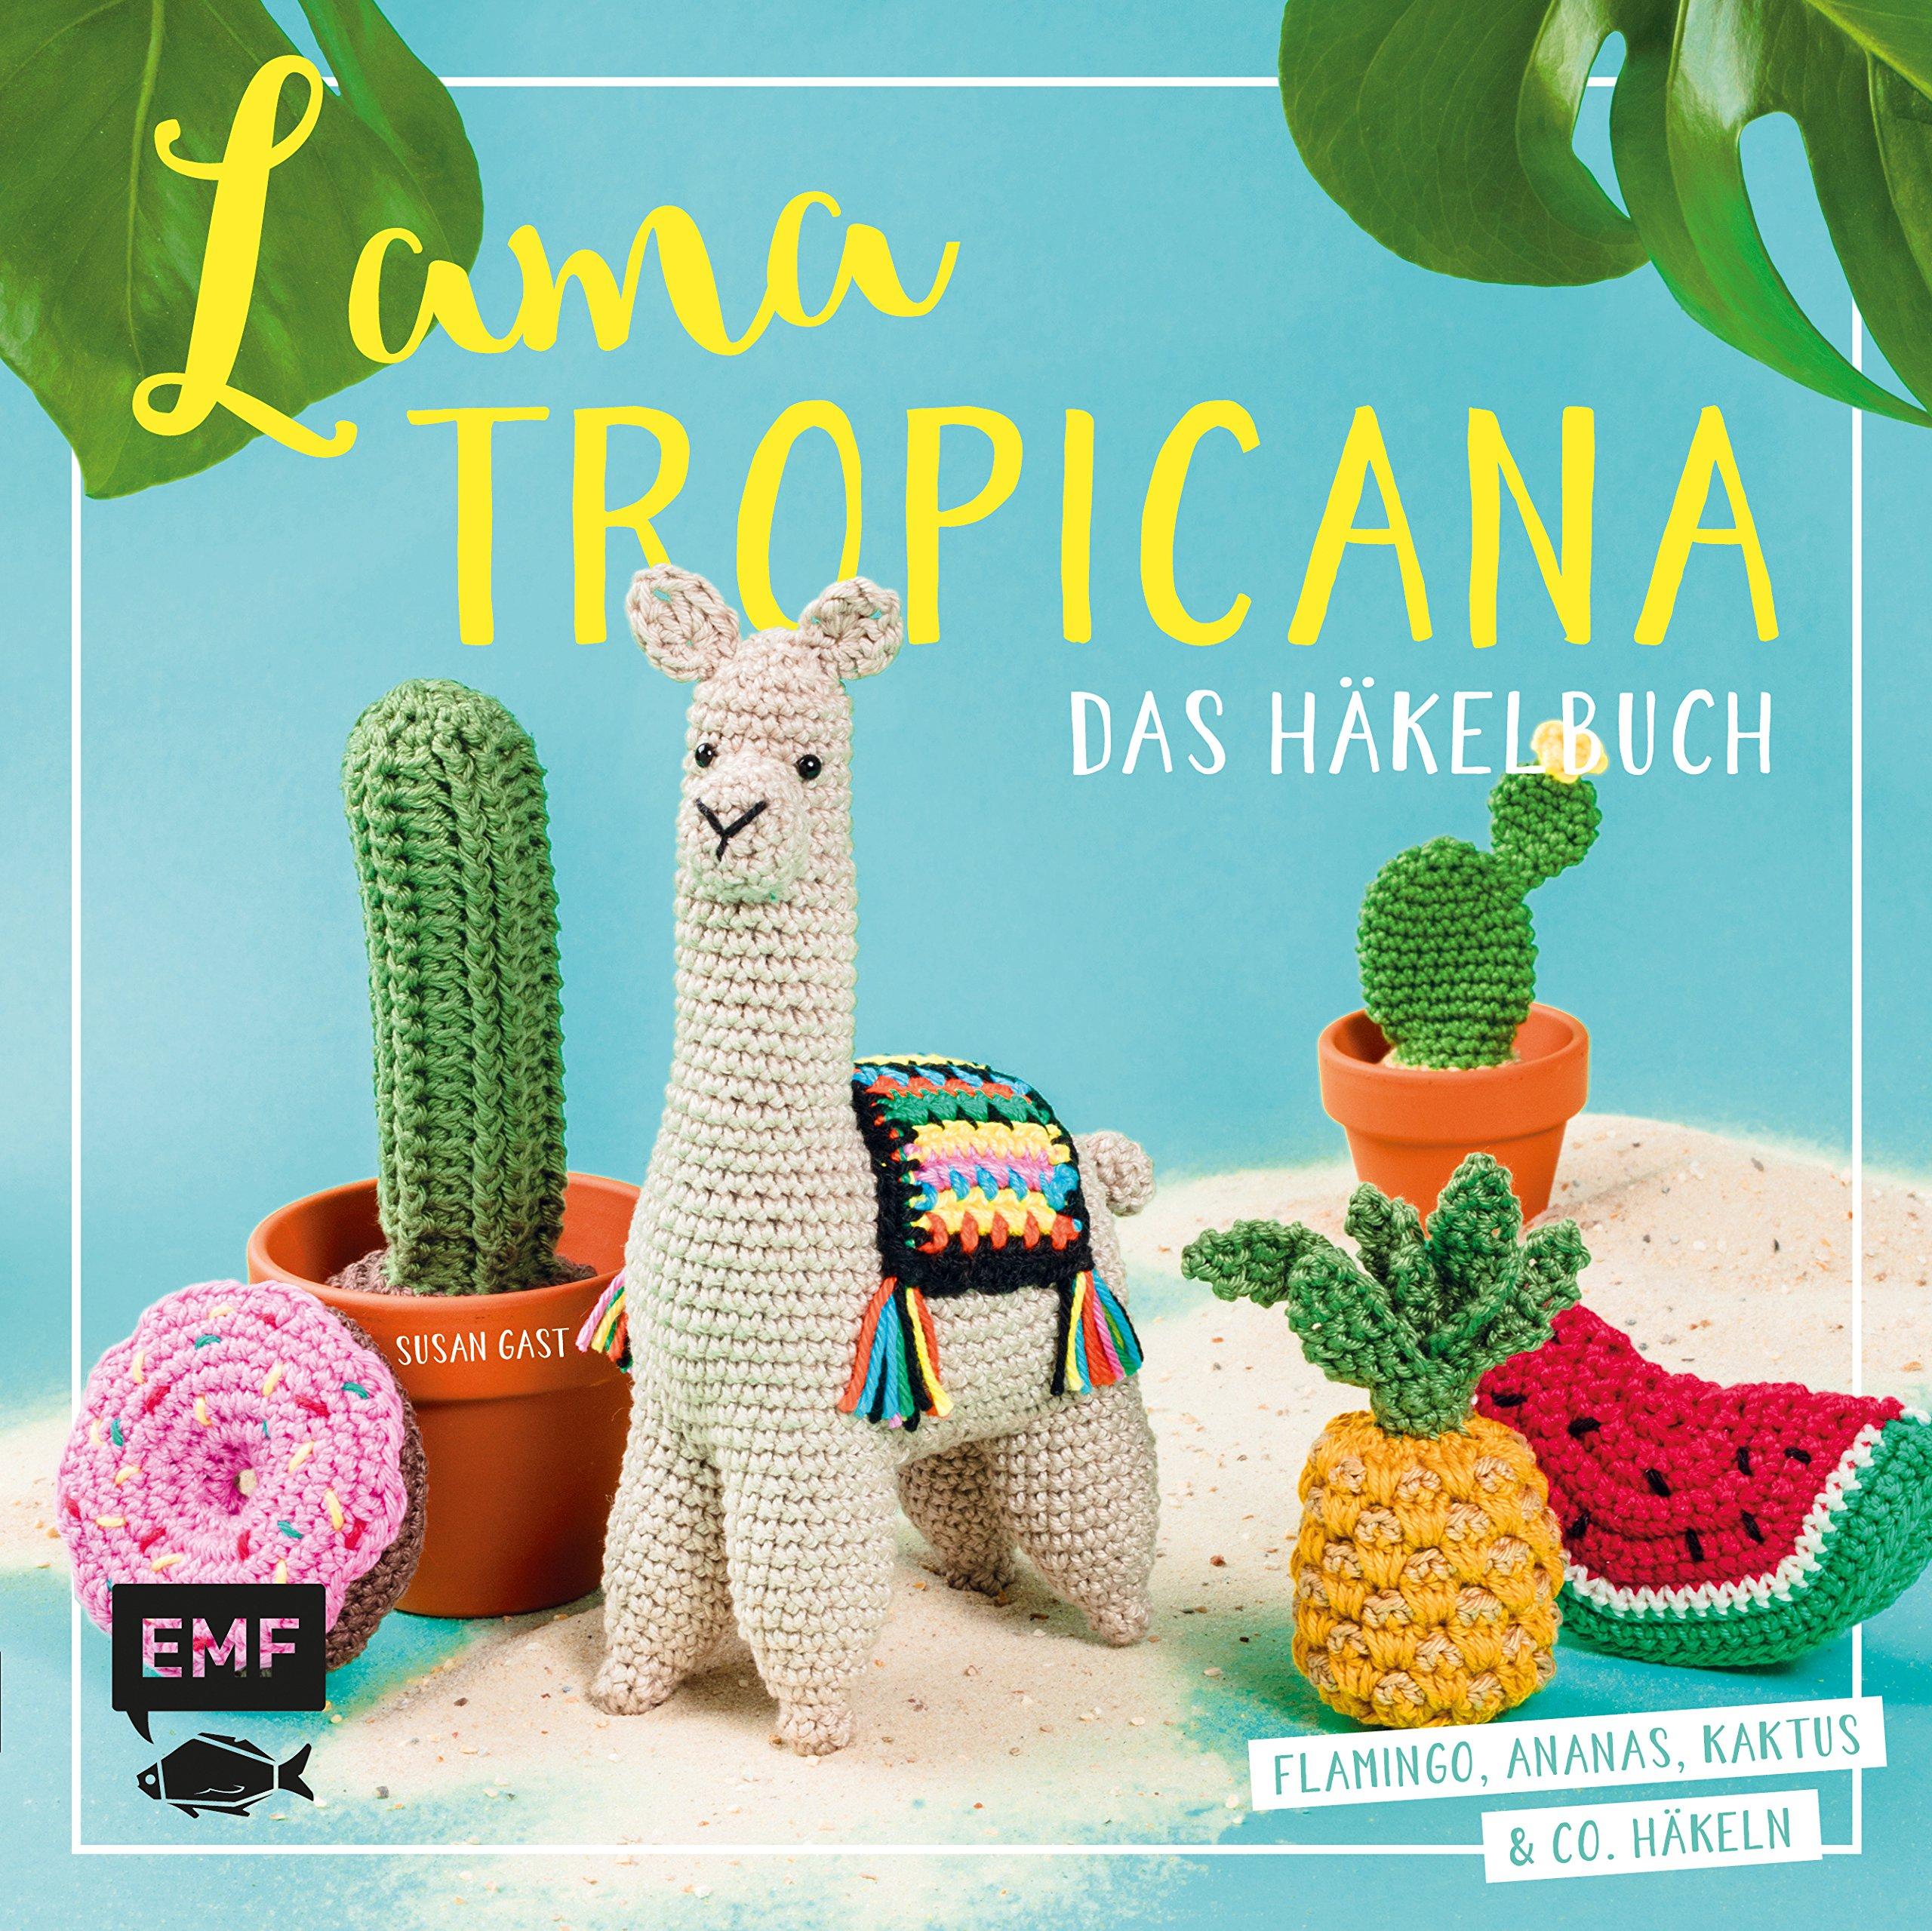 Lama Tropicana Das Häkelbuch Flamingo Ananas Kaktus Und Co